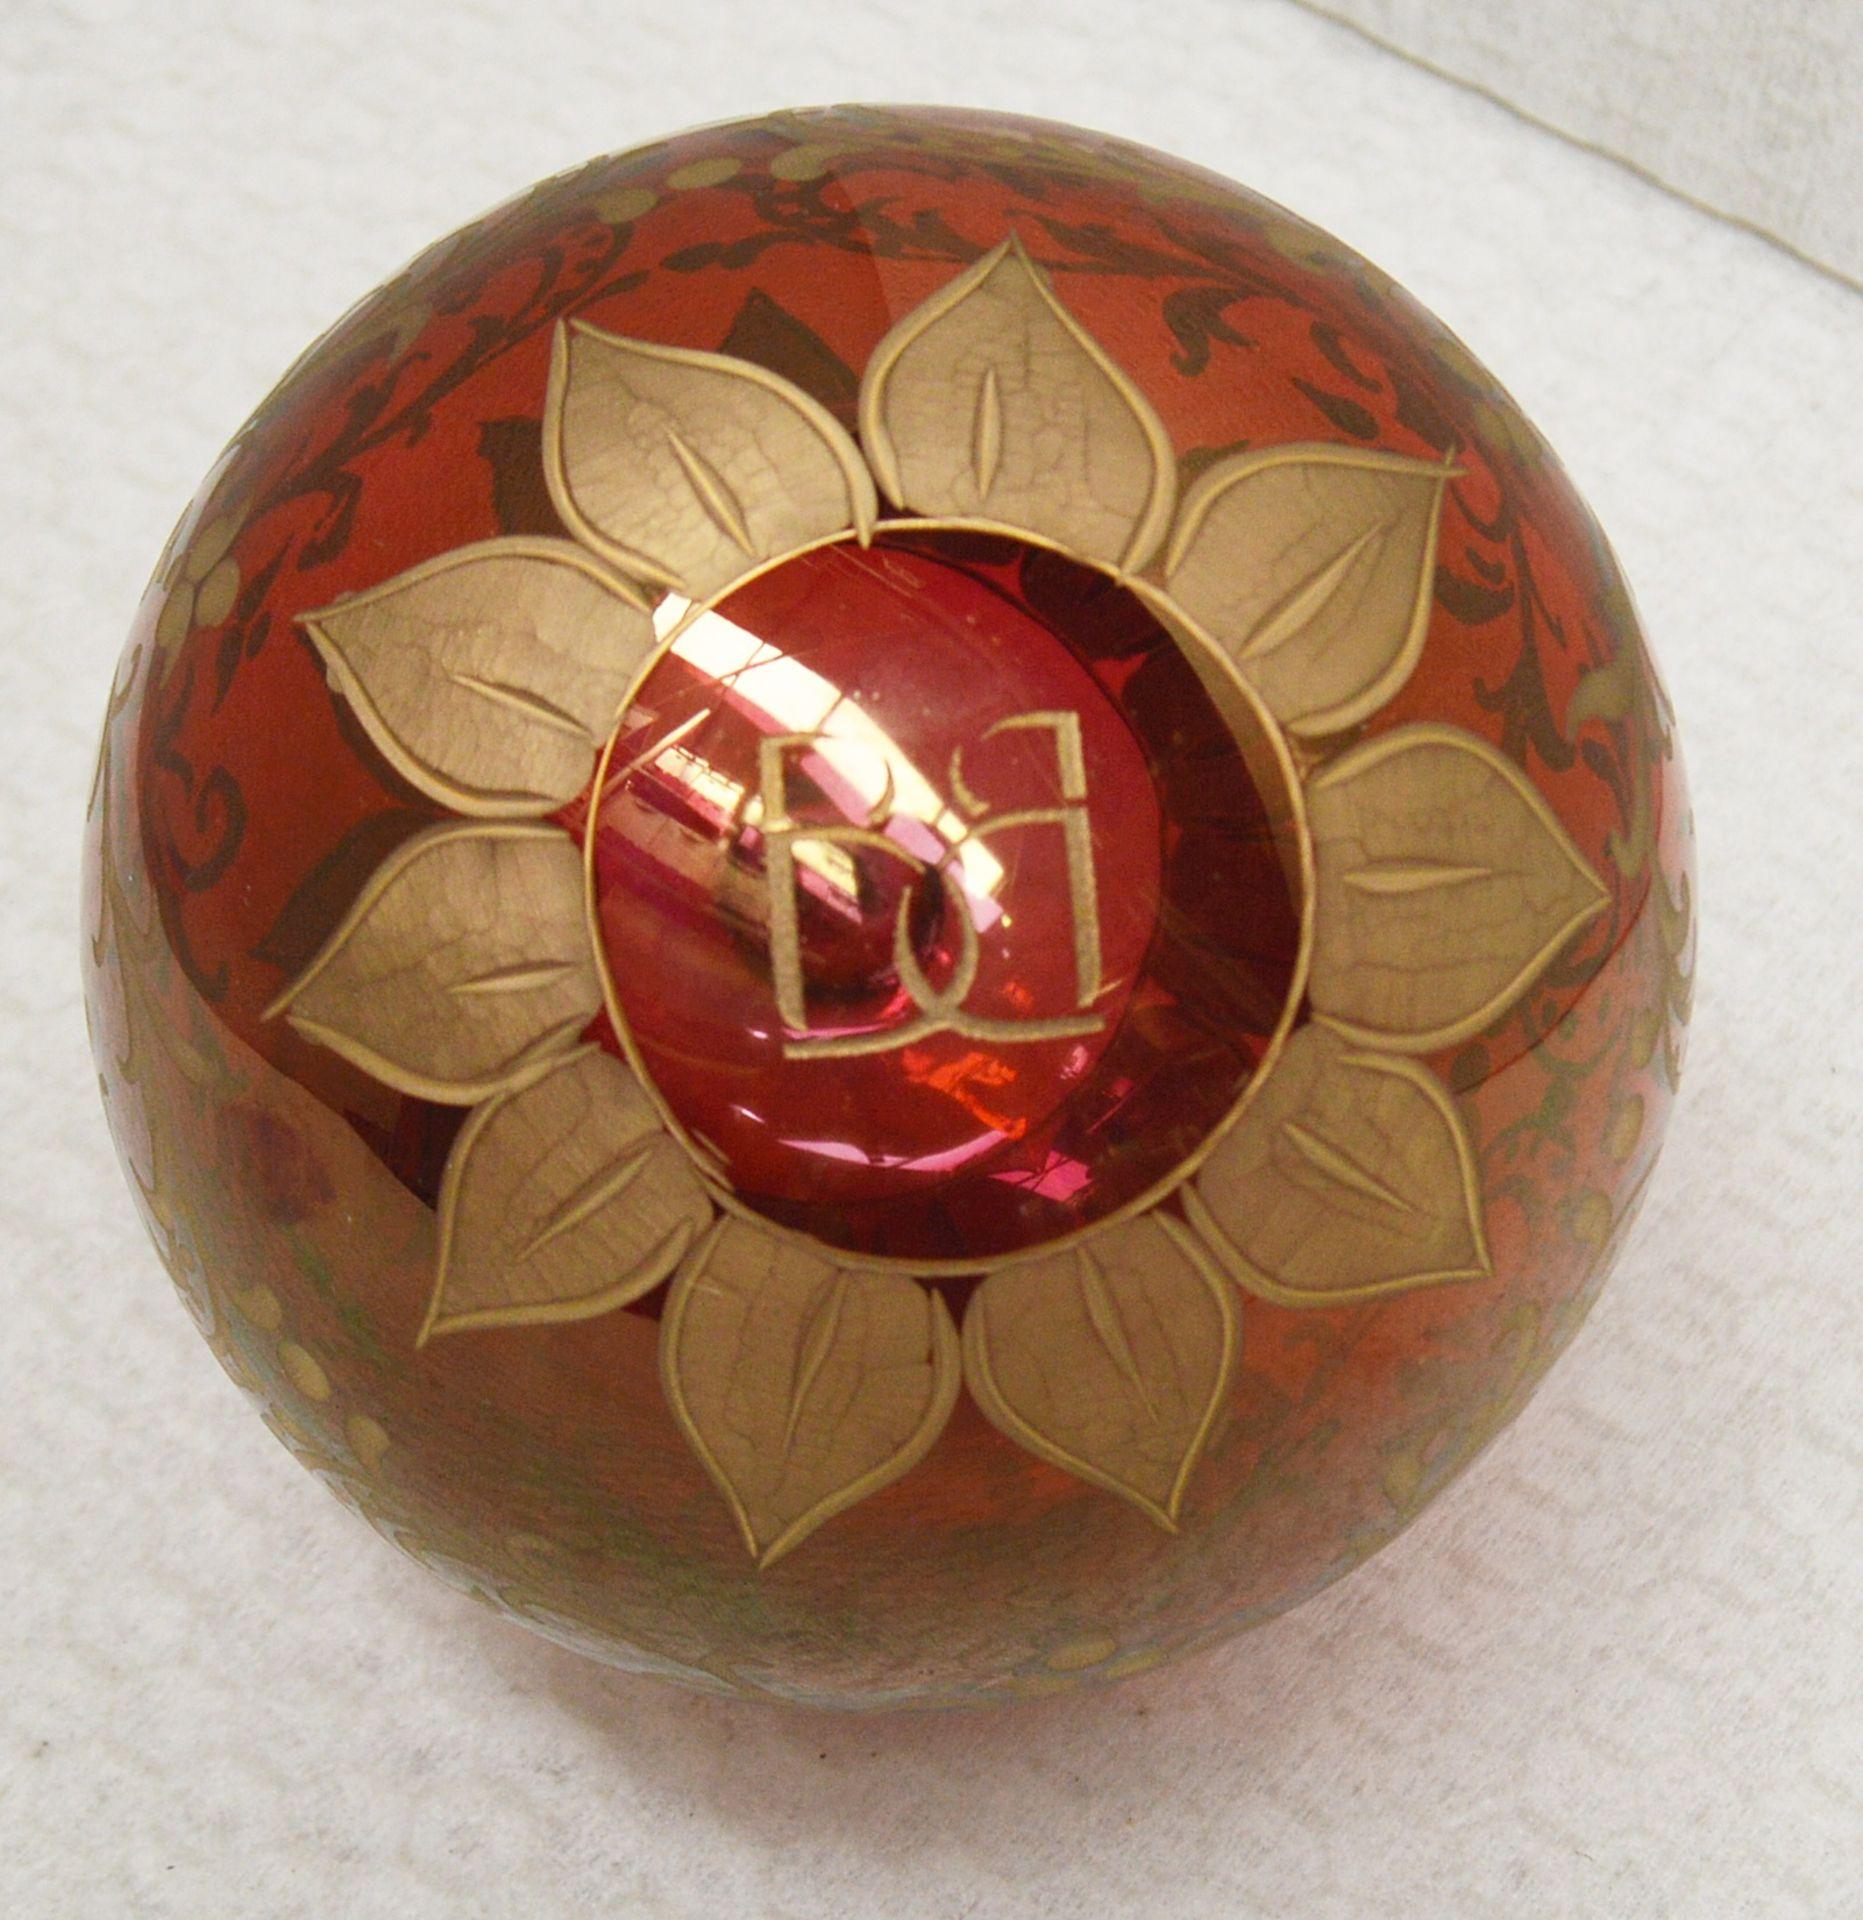 1 x BALDI 'Home Jewels' Italian Hand-crafted Artisan Christmas Tree Decoration - RRP £124.00 - Image 2 of 3